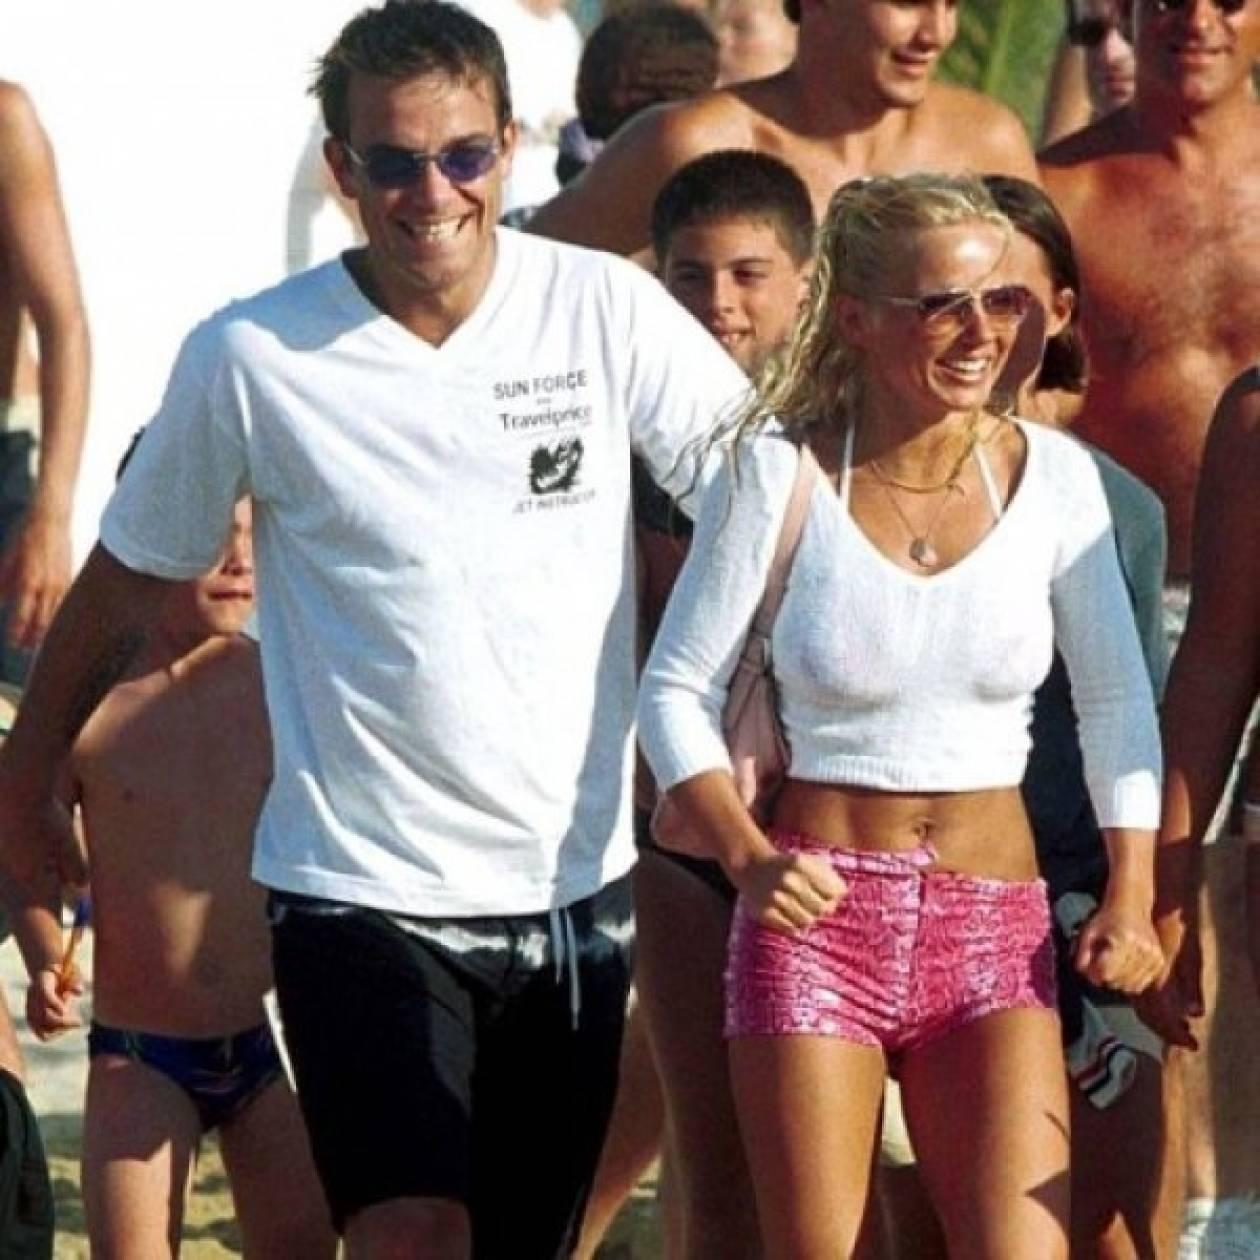 Robbie Williams: Με την Geri Halliwell τα είχε, άλλη Spice Girl ήθελε